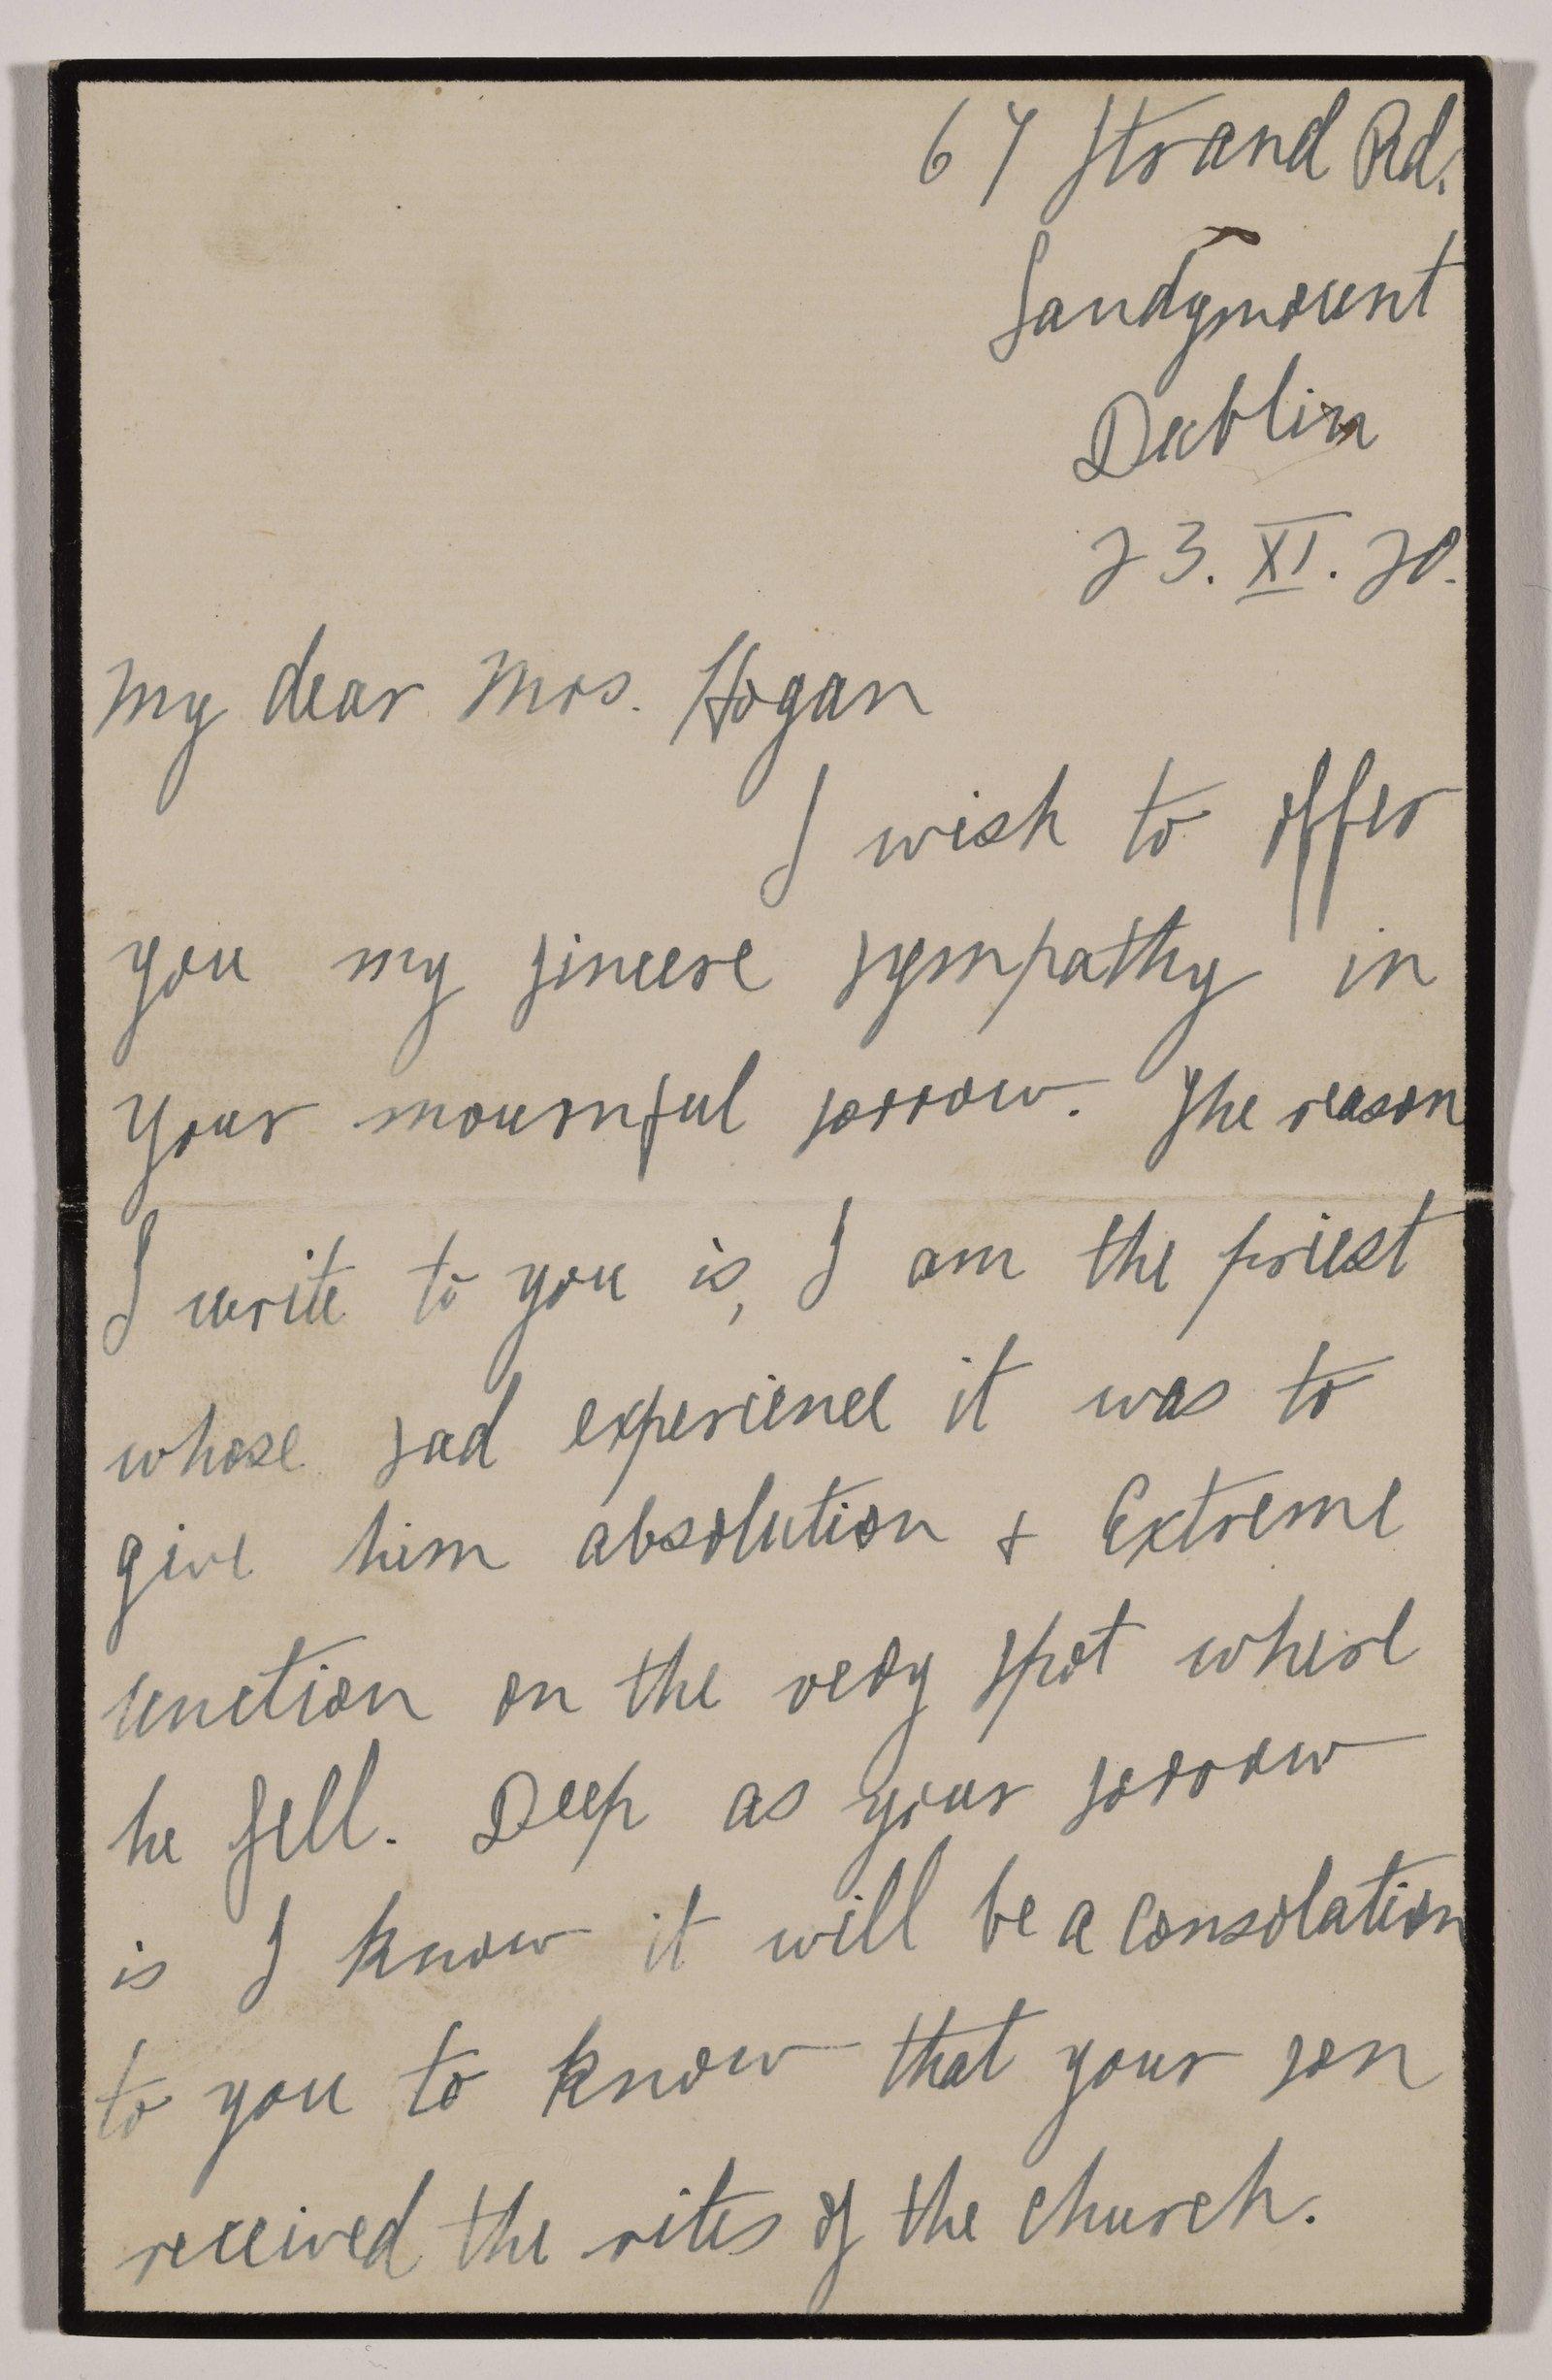 Image - Fr. Edward (Ned) O'Brien's letter to Mrs Hogan